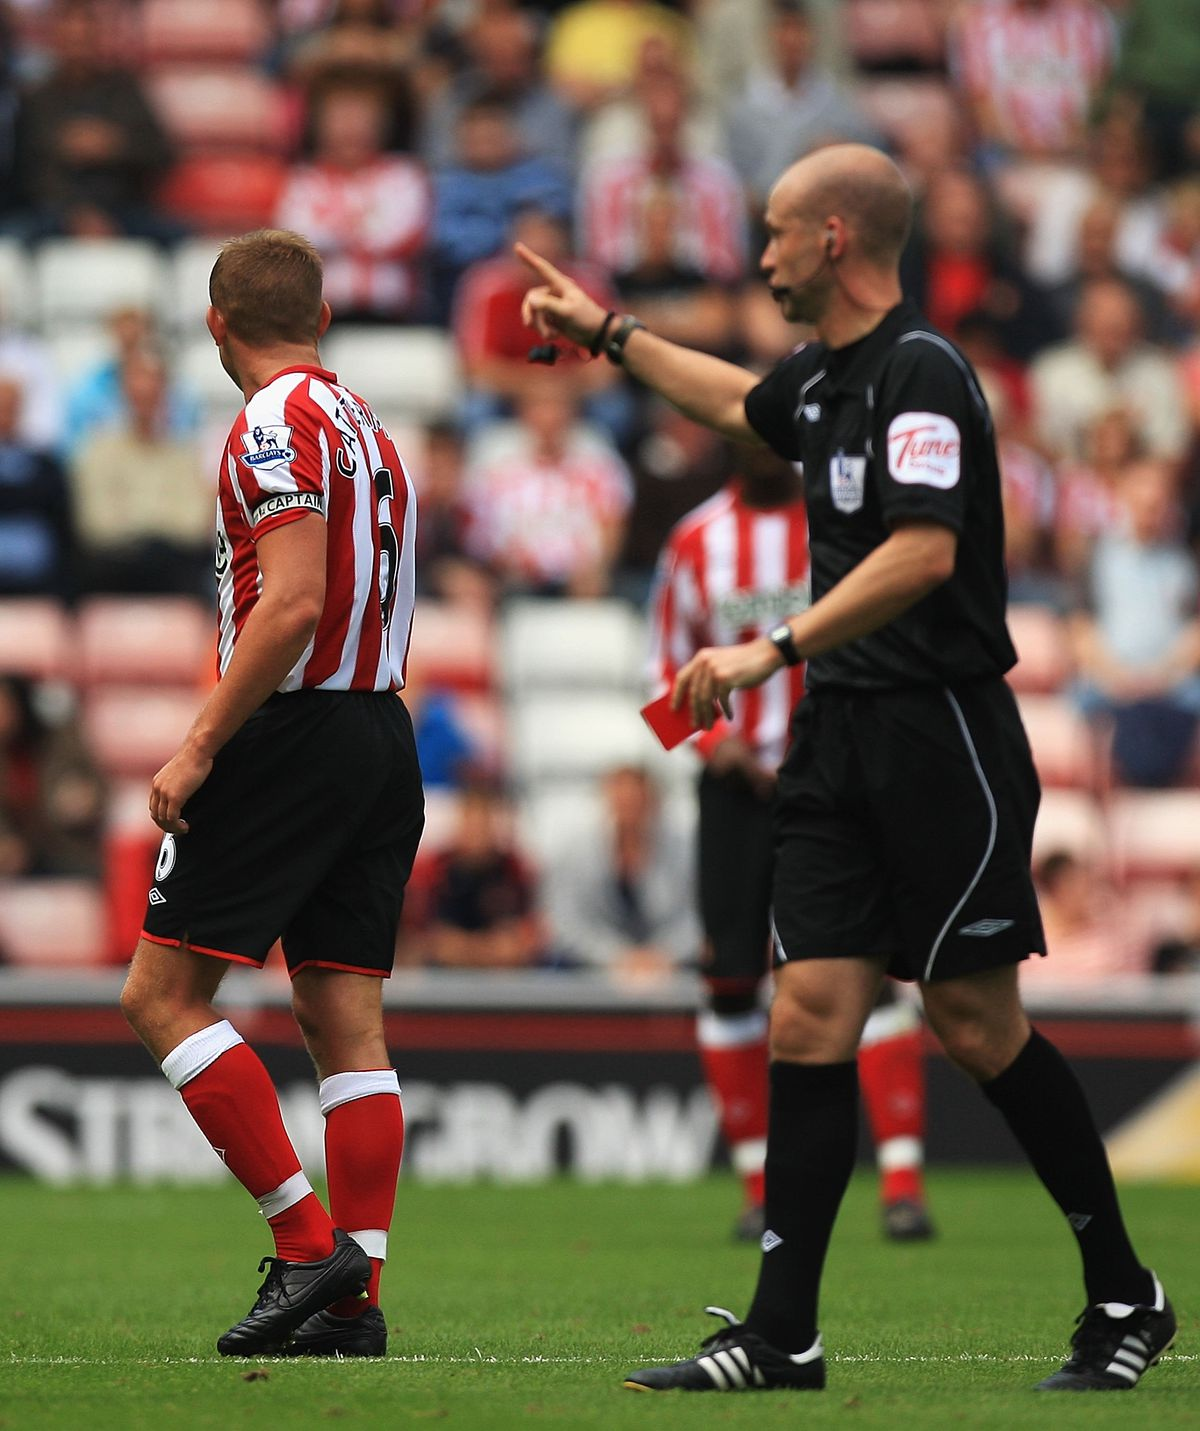 Sunderland v Birmingham City - Premier League